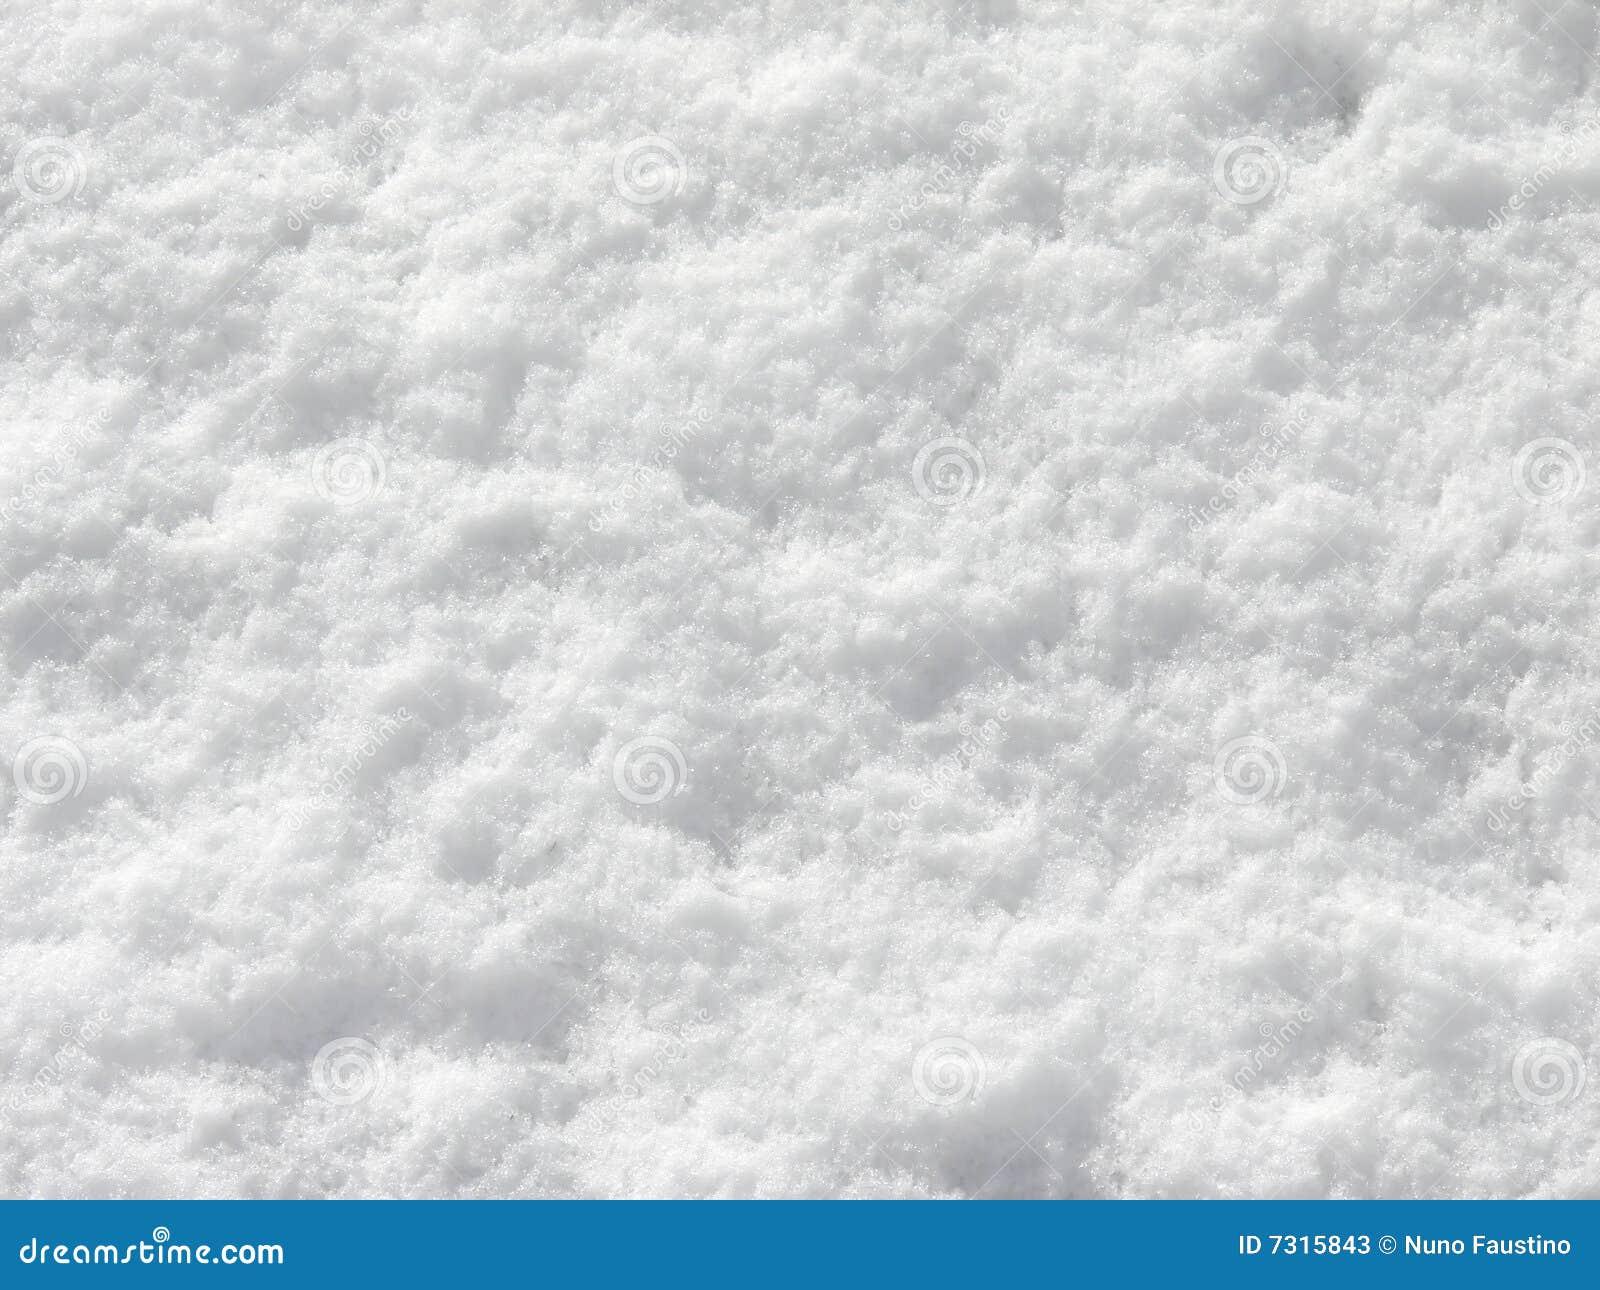 Close snow texture up white